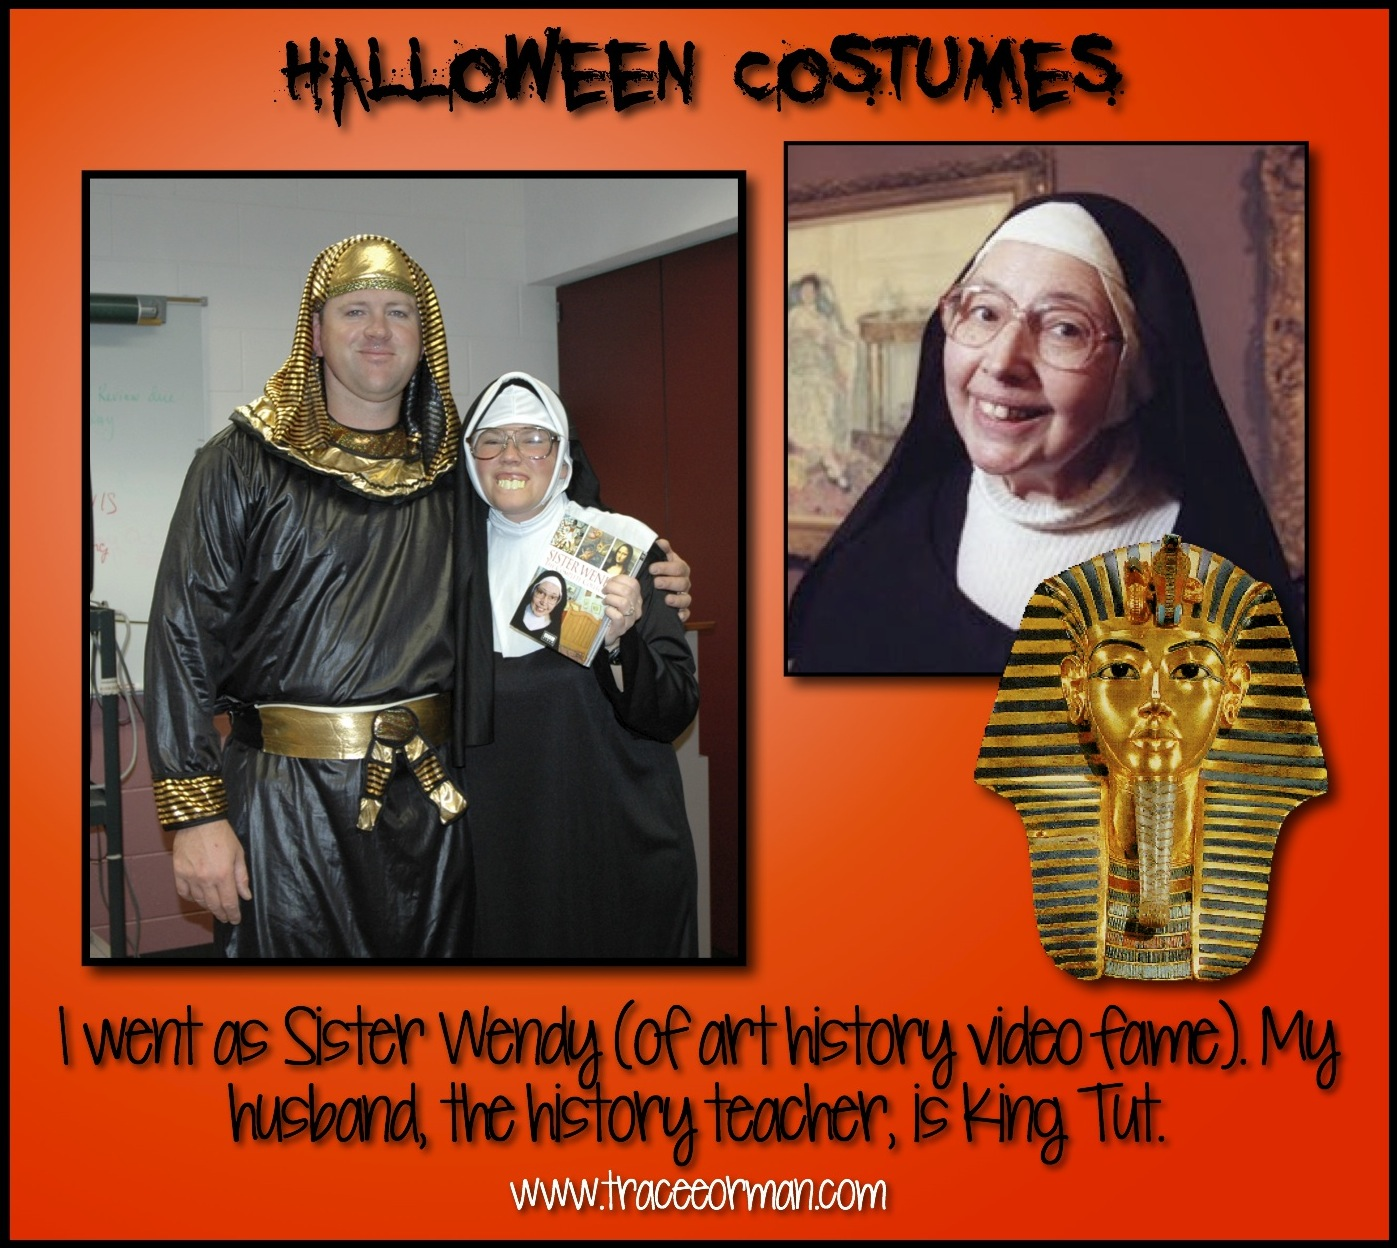 wwwtraceeormancom halloween costumes